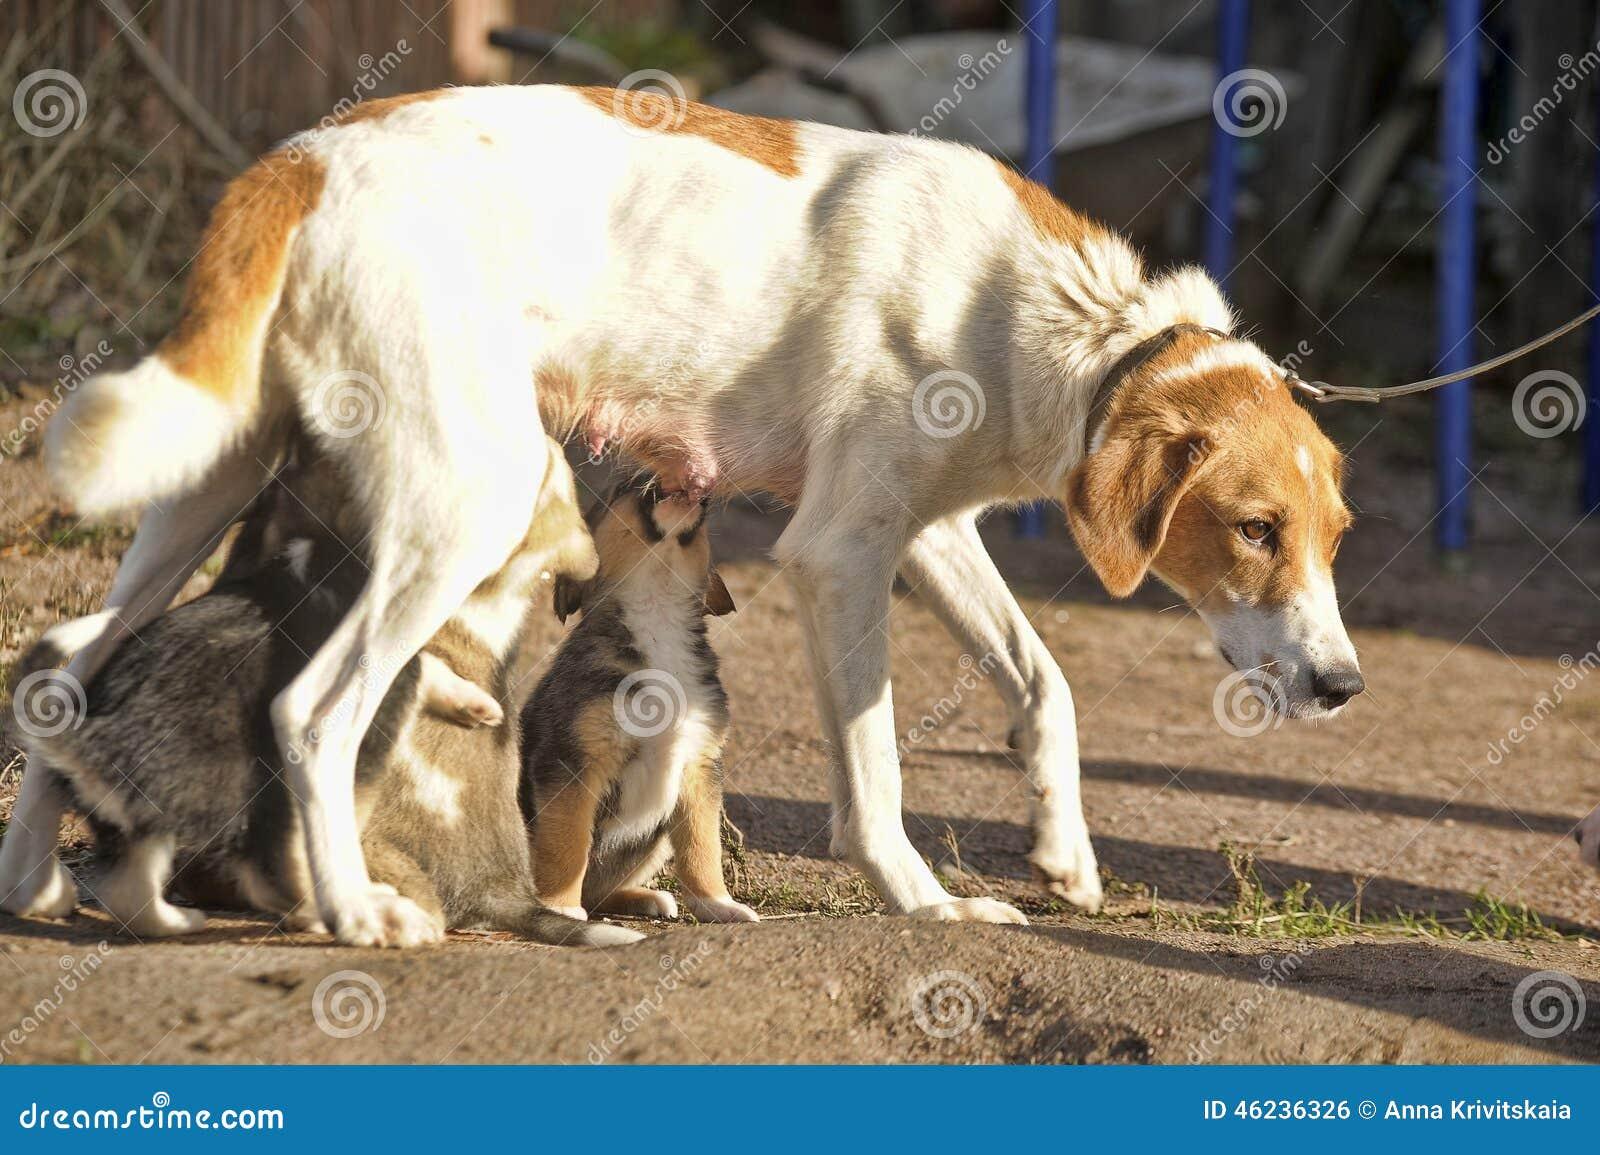 Hound Dog Puppies Feeding Stock Photo Image 46236326